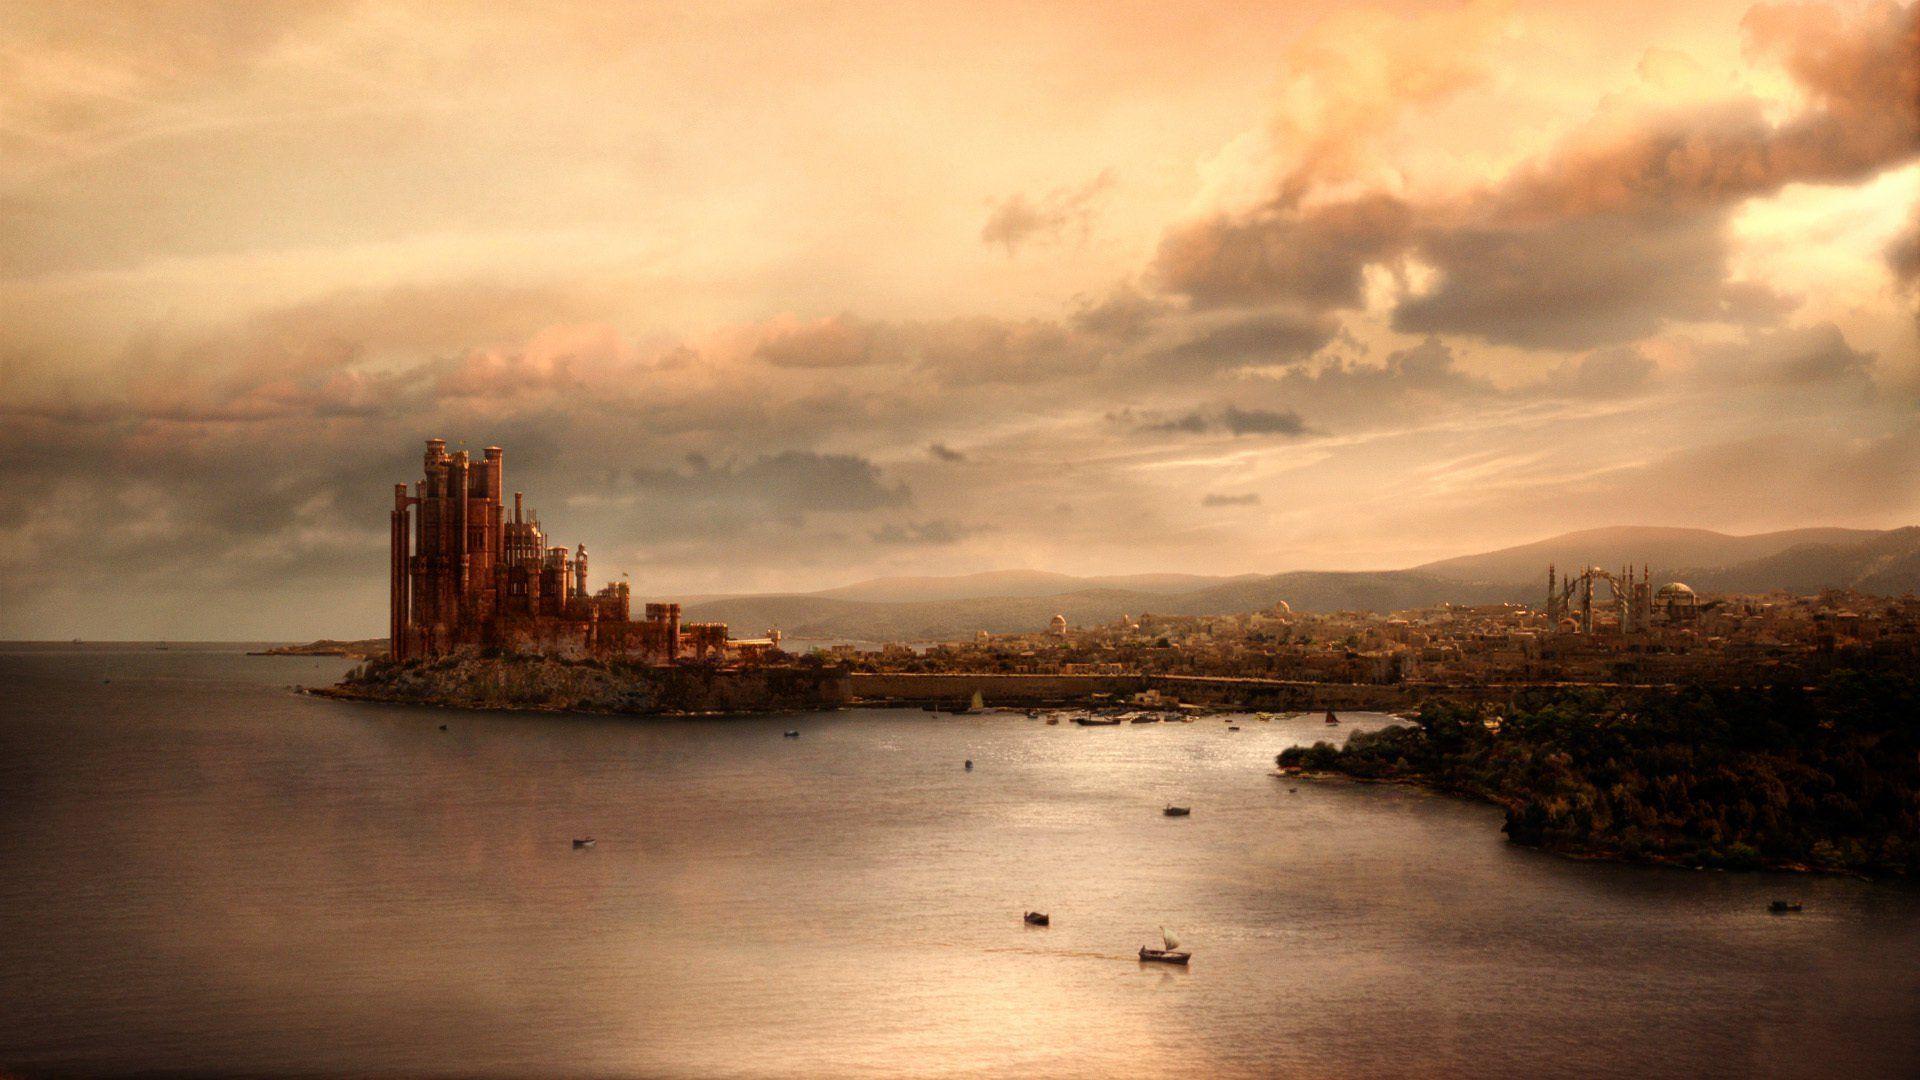 Game Of Thrones Season 4 Episode 5 Stream